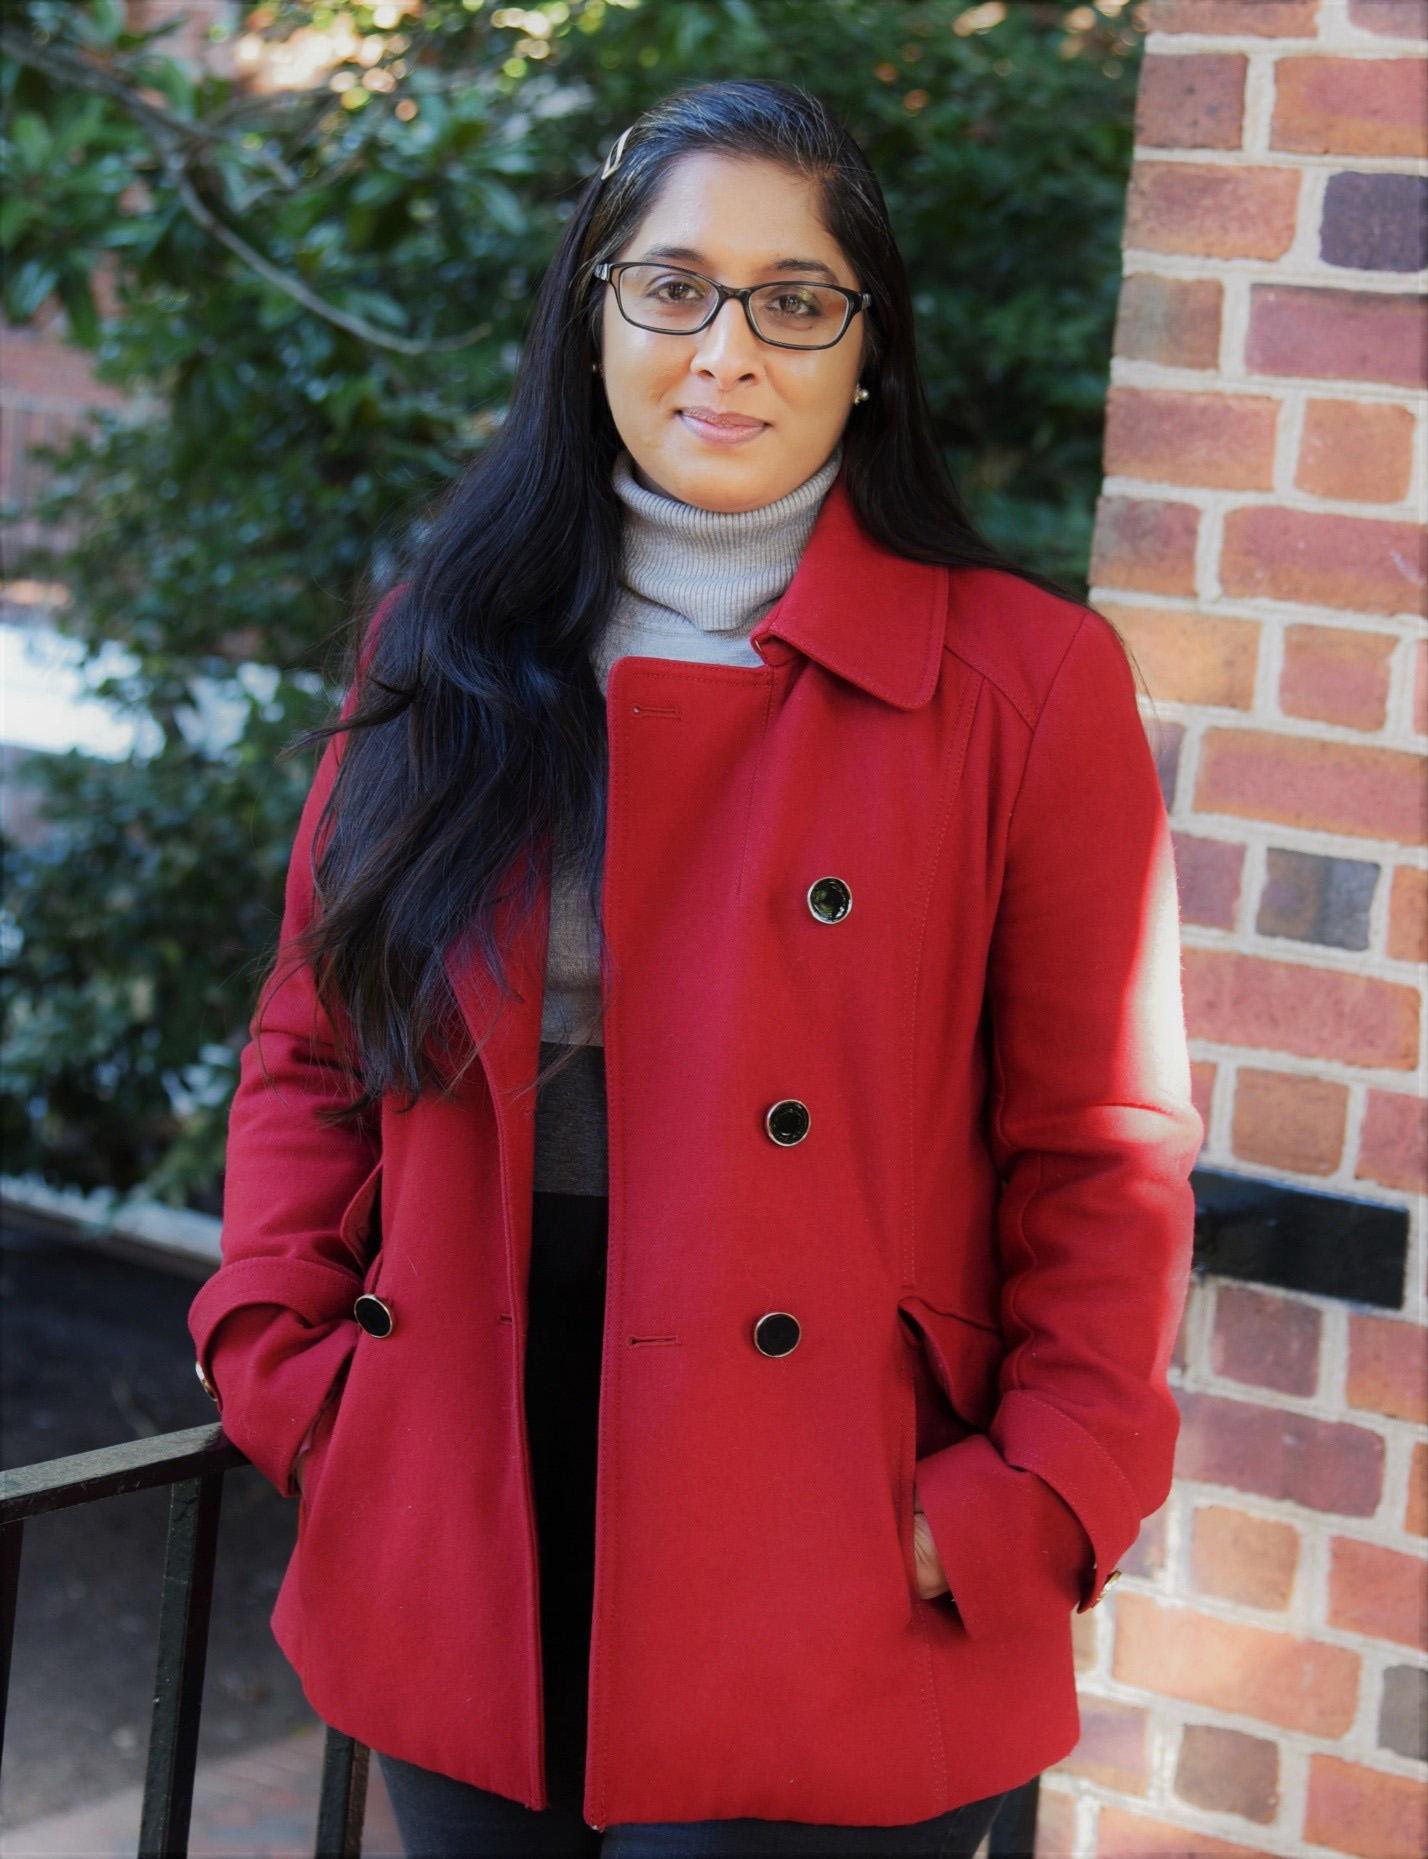 NRL Scientist Celebrates Her Heritage and STEM Career